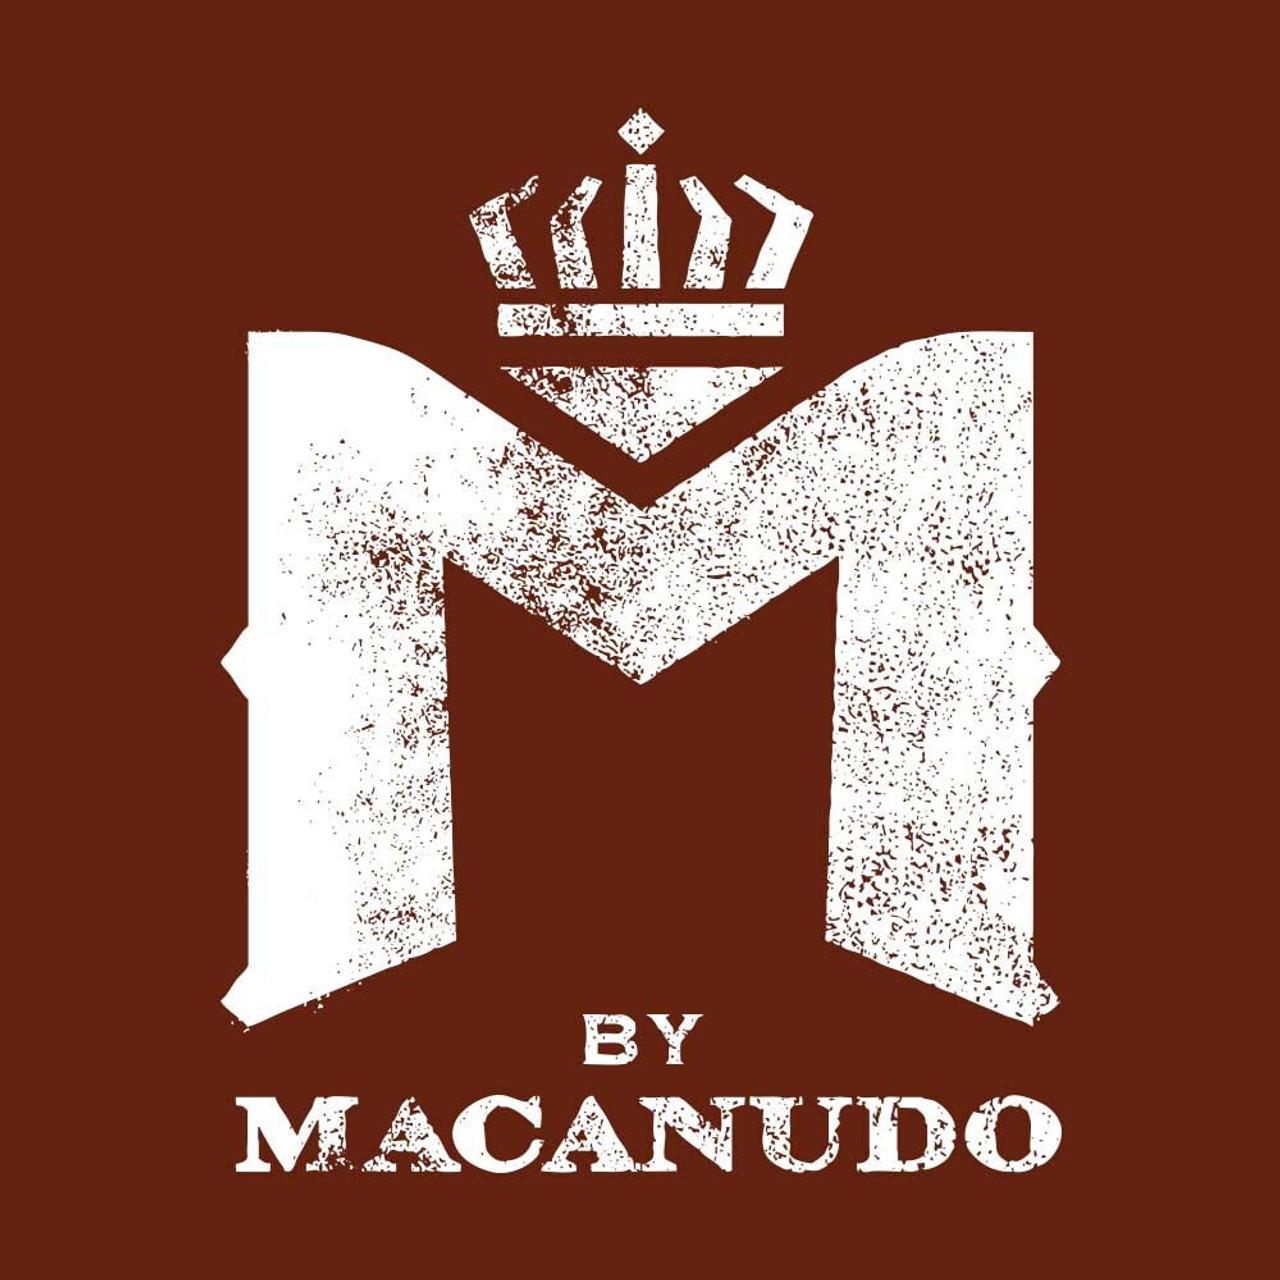 M Bourbon by Macanudo Robusto Cigars - 5.0 x 50 (Box of 20)